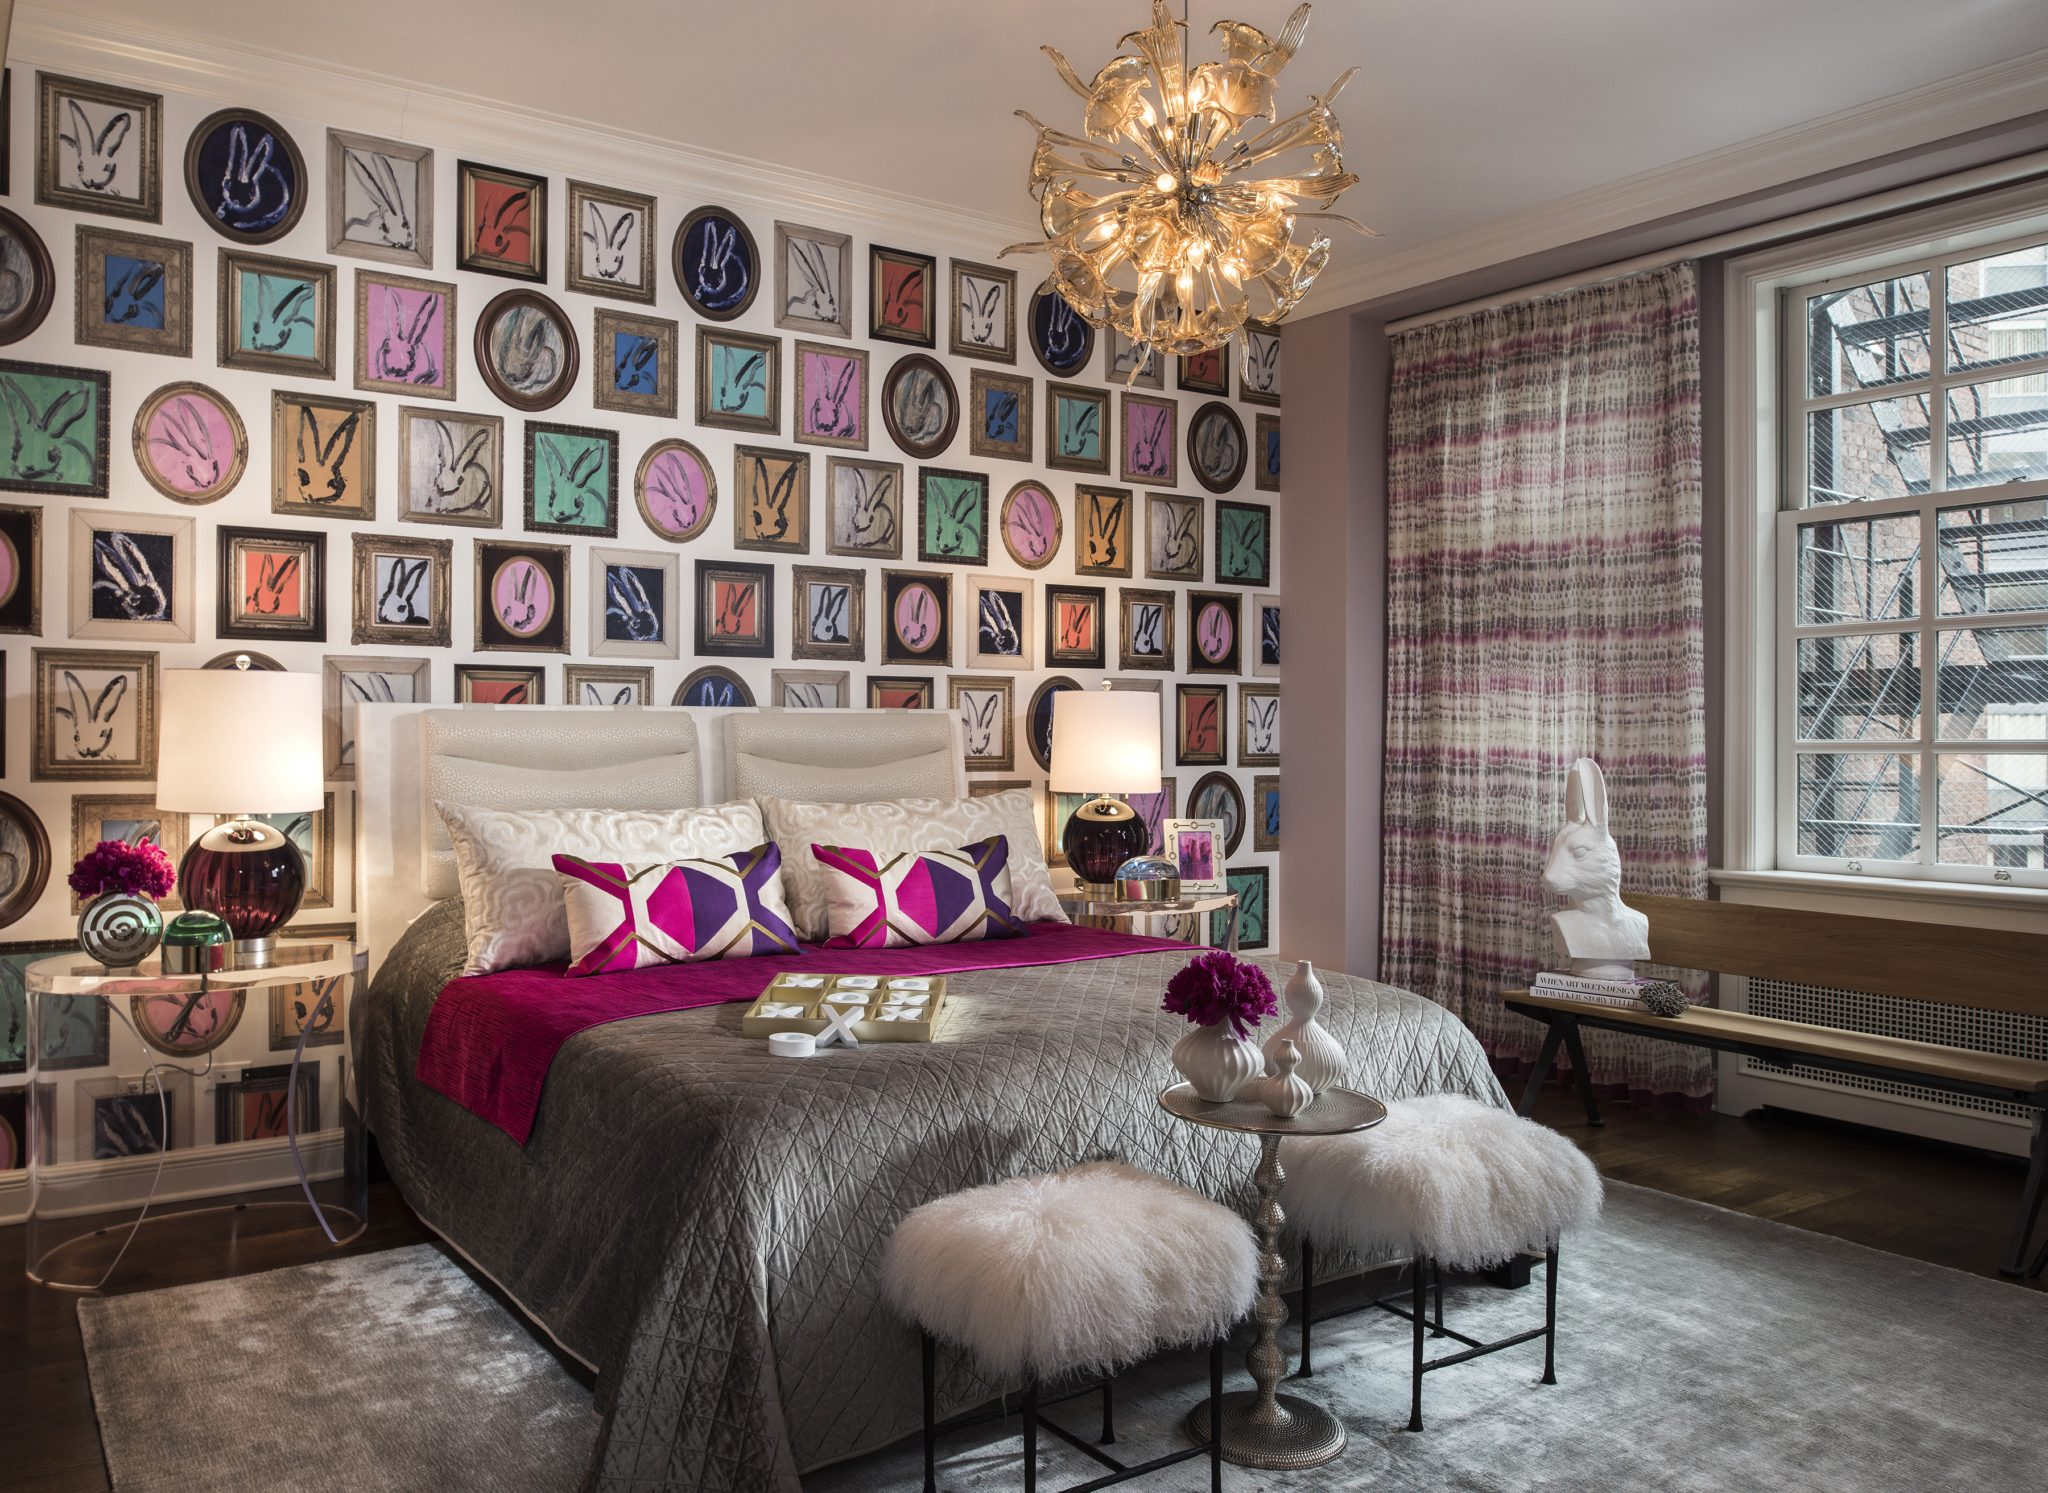 Whimsical bedroom by Donna Mondi Interior Design